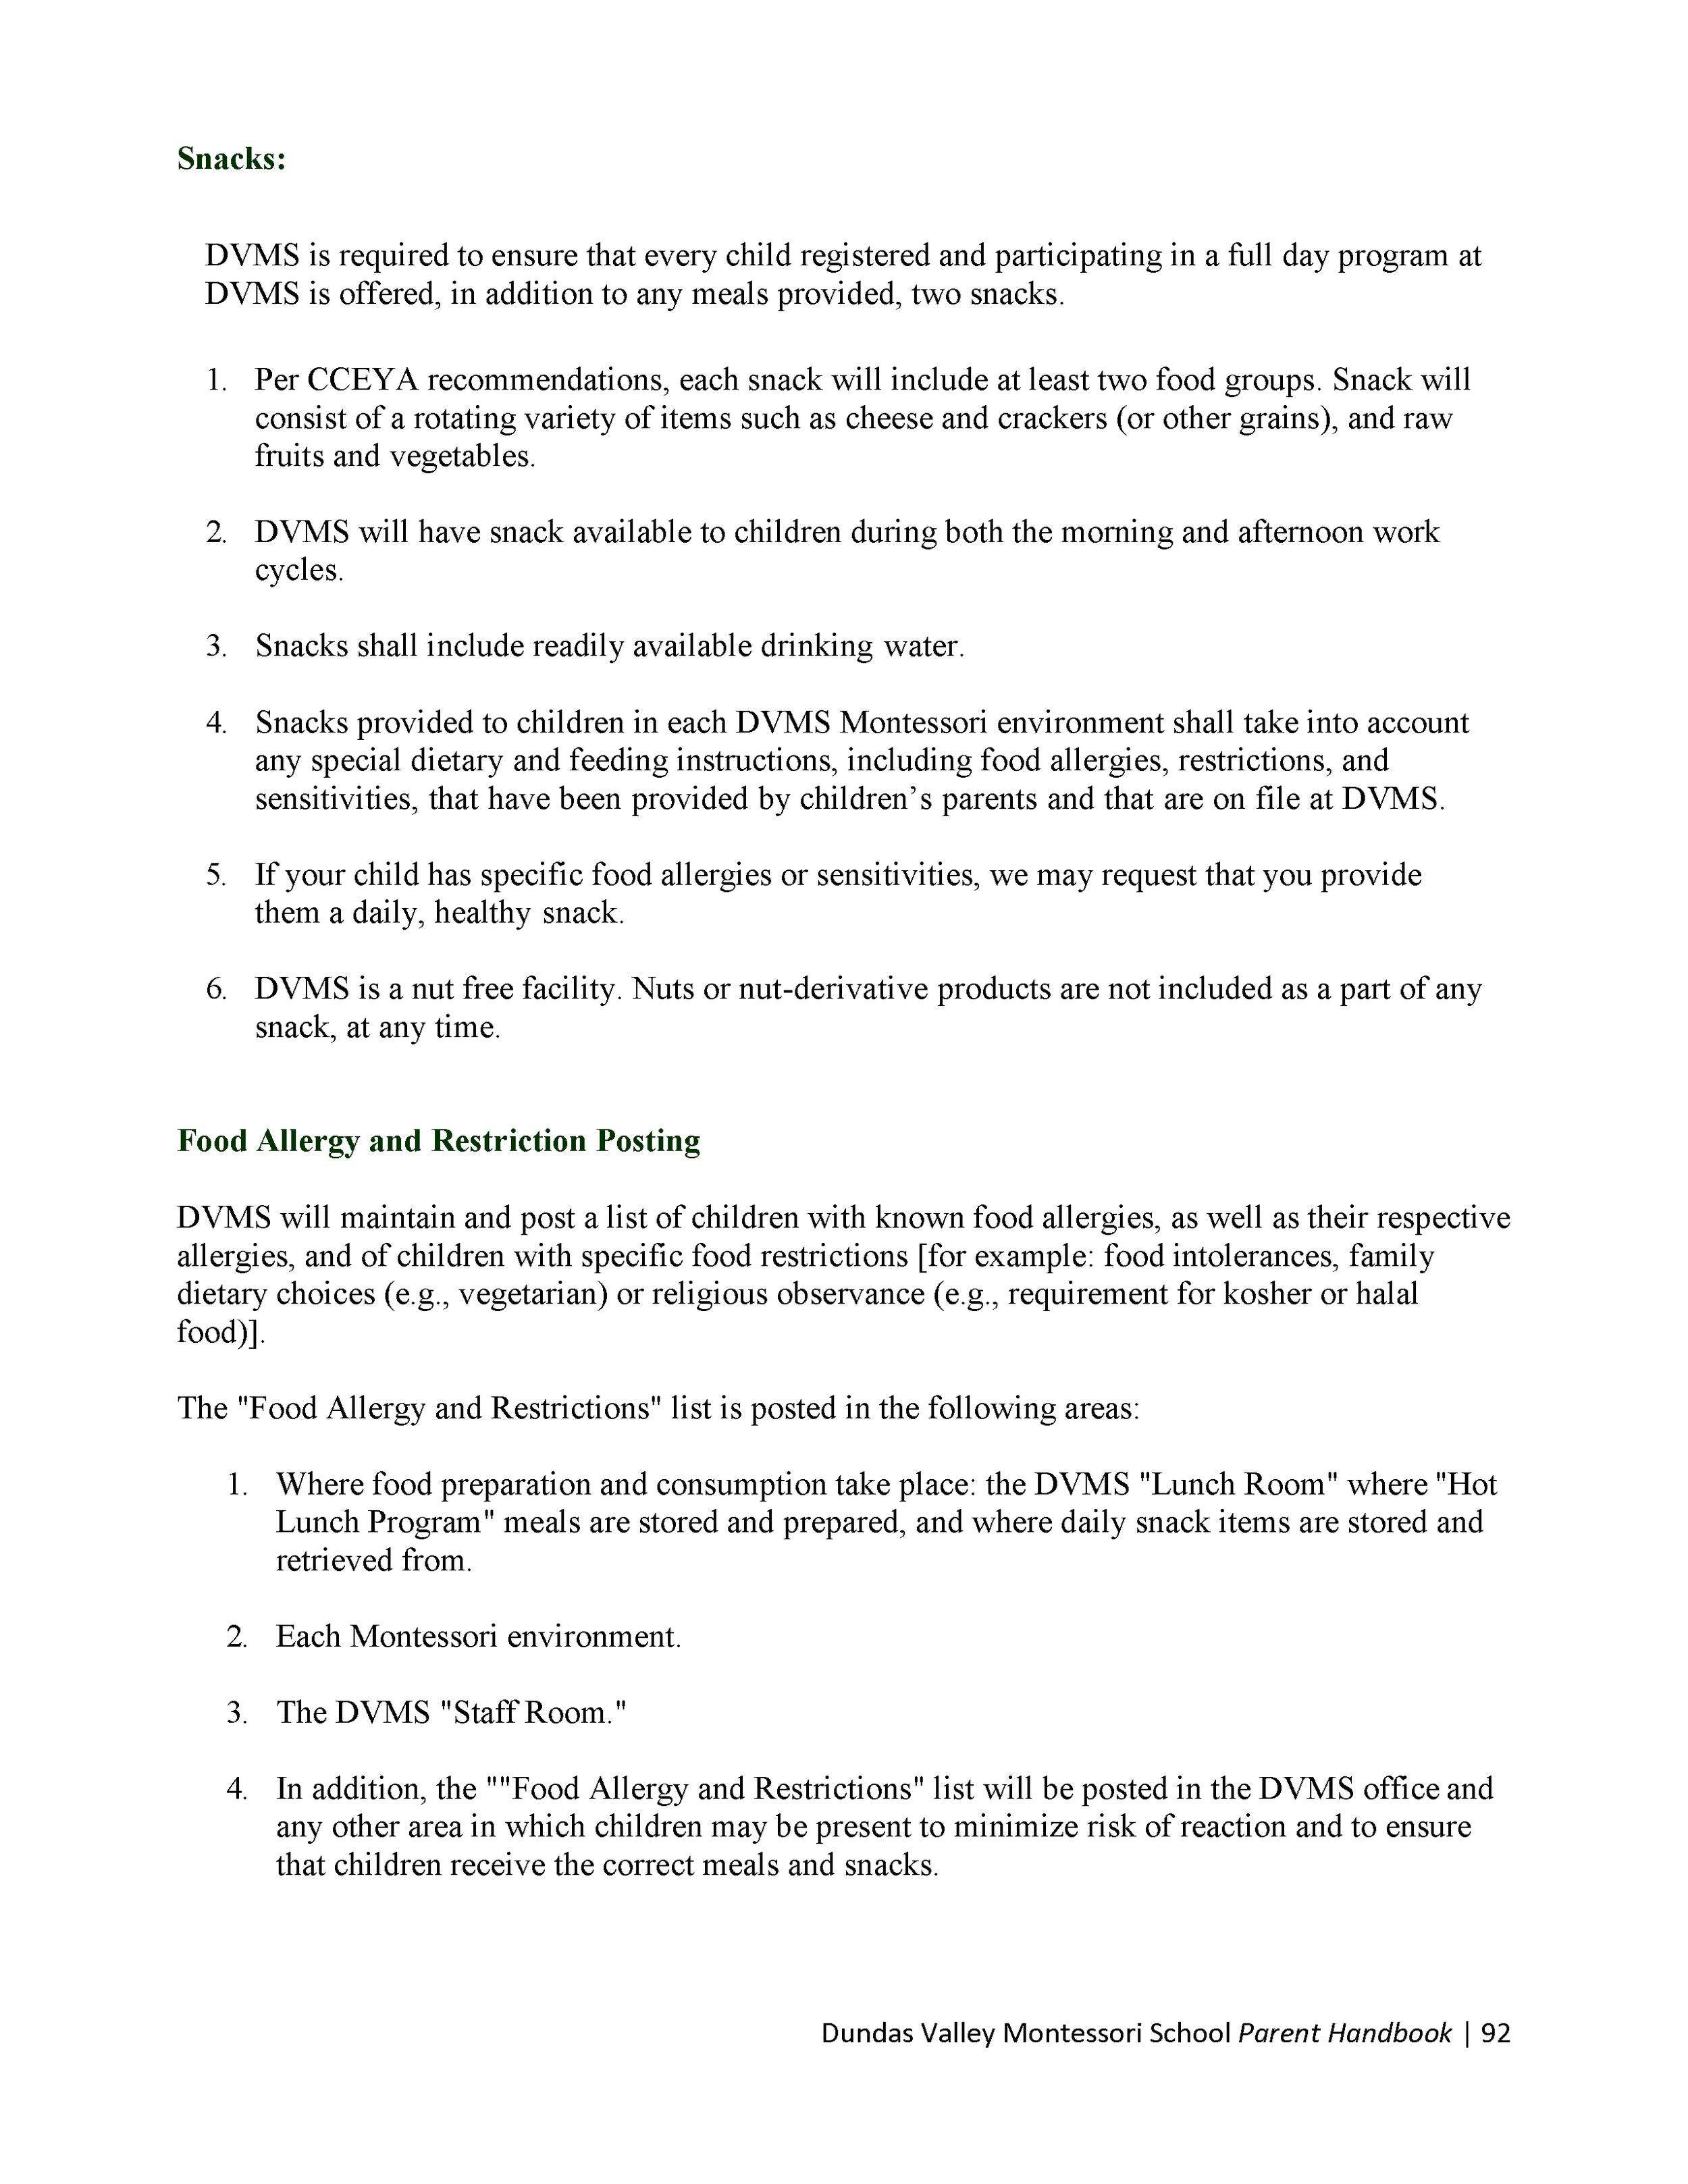 DVMS-Parent-Handbook-19-20_Page_094.png